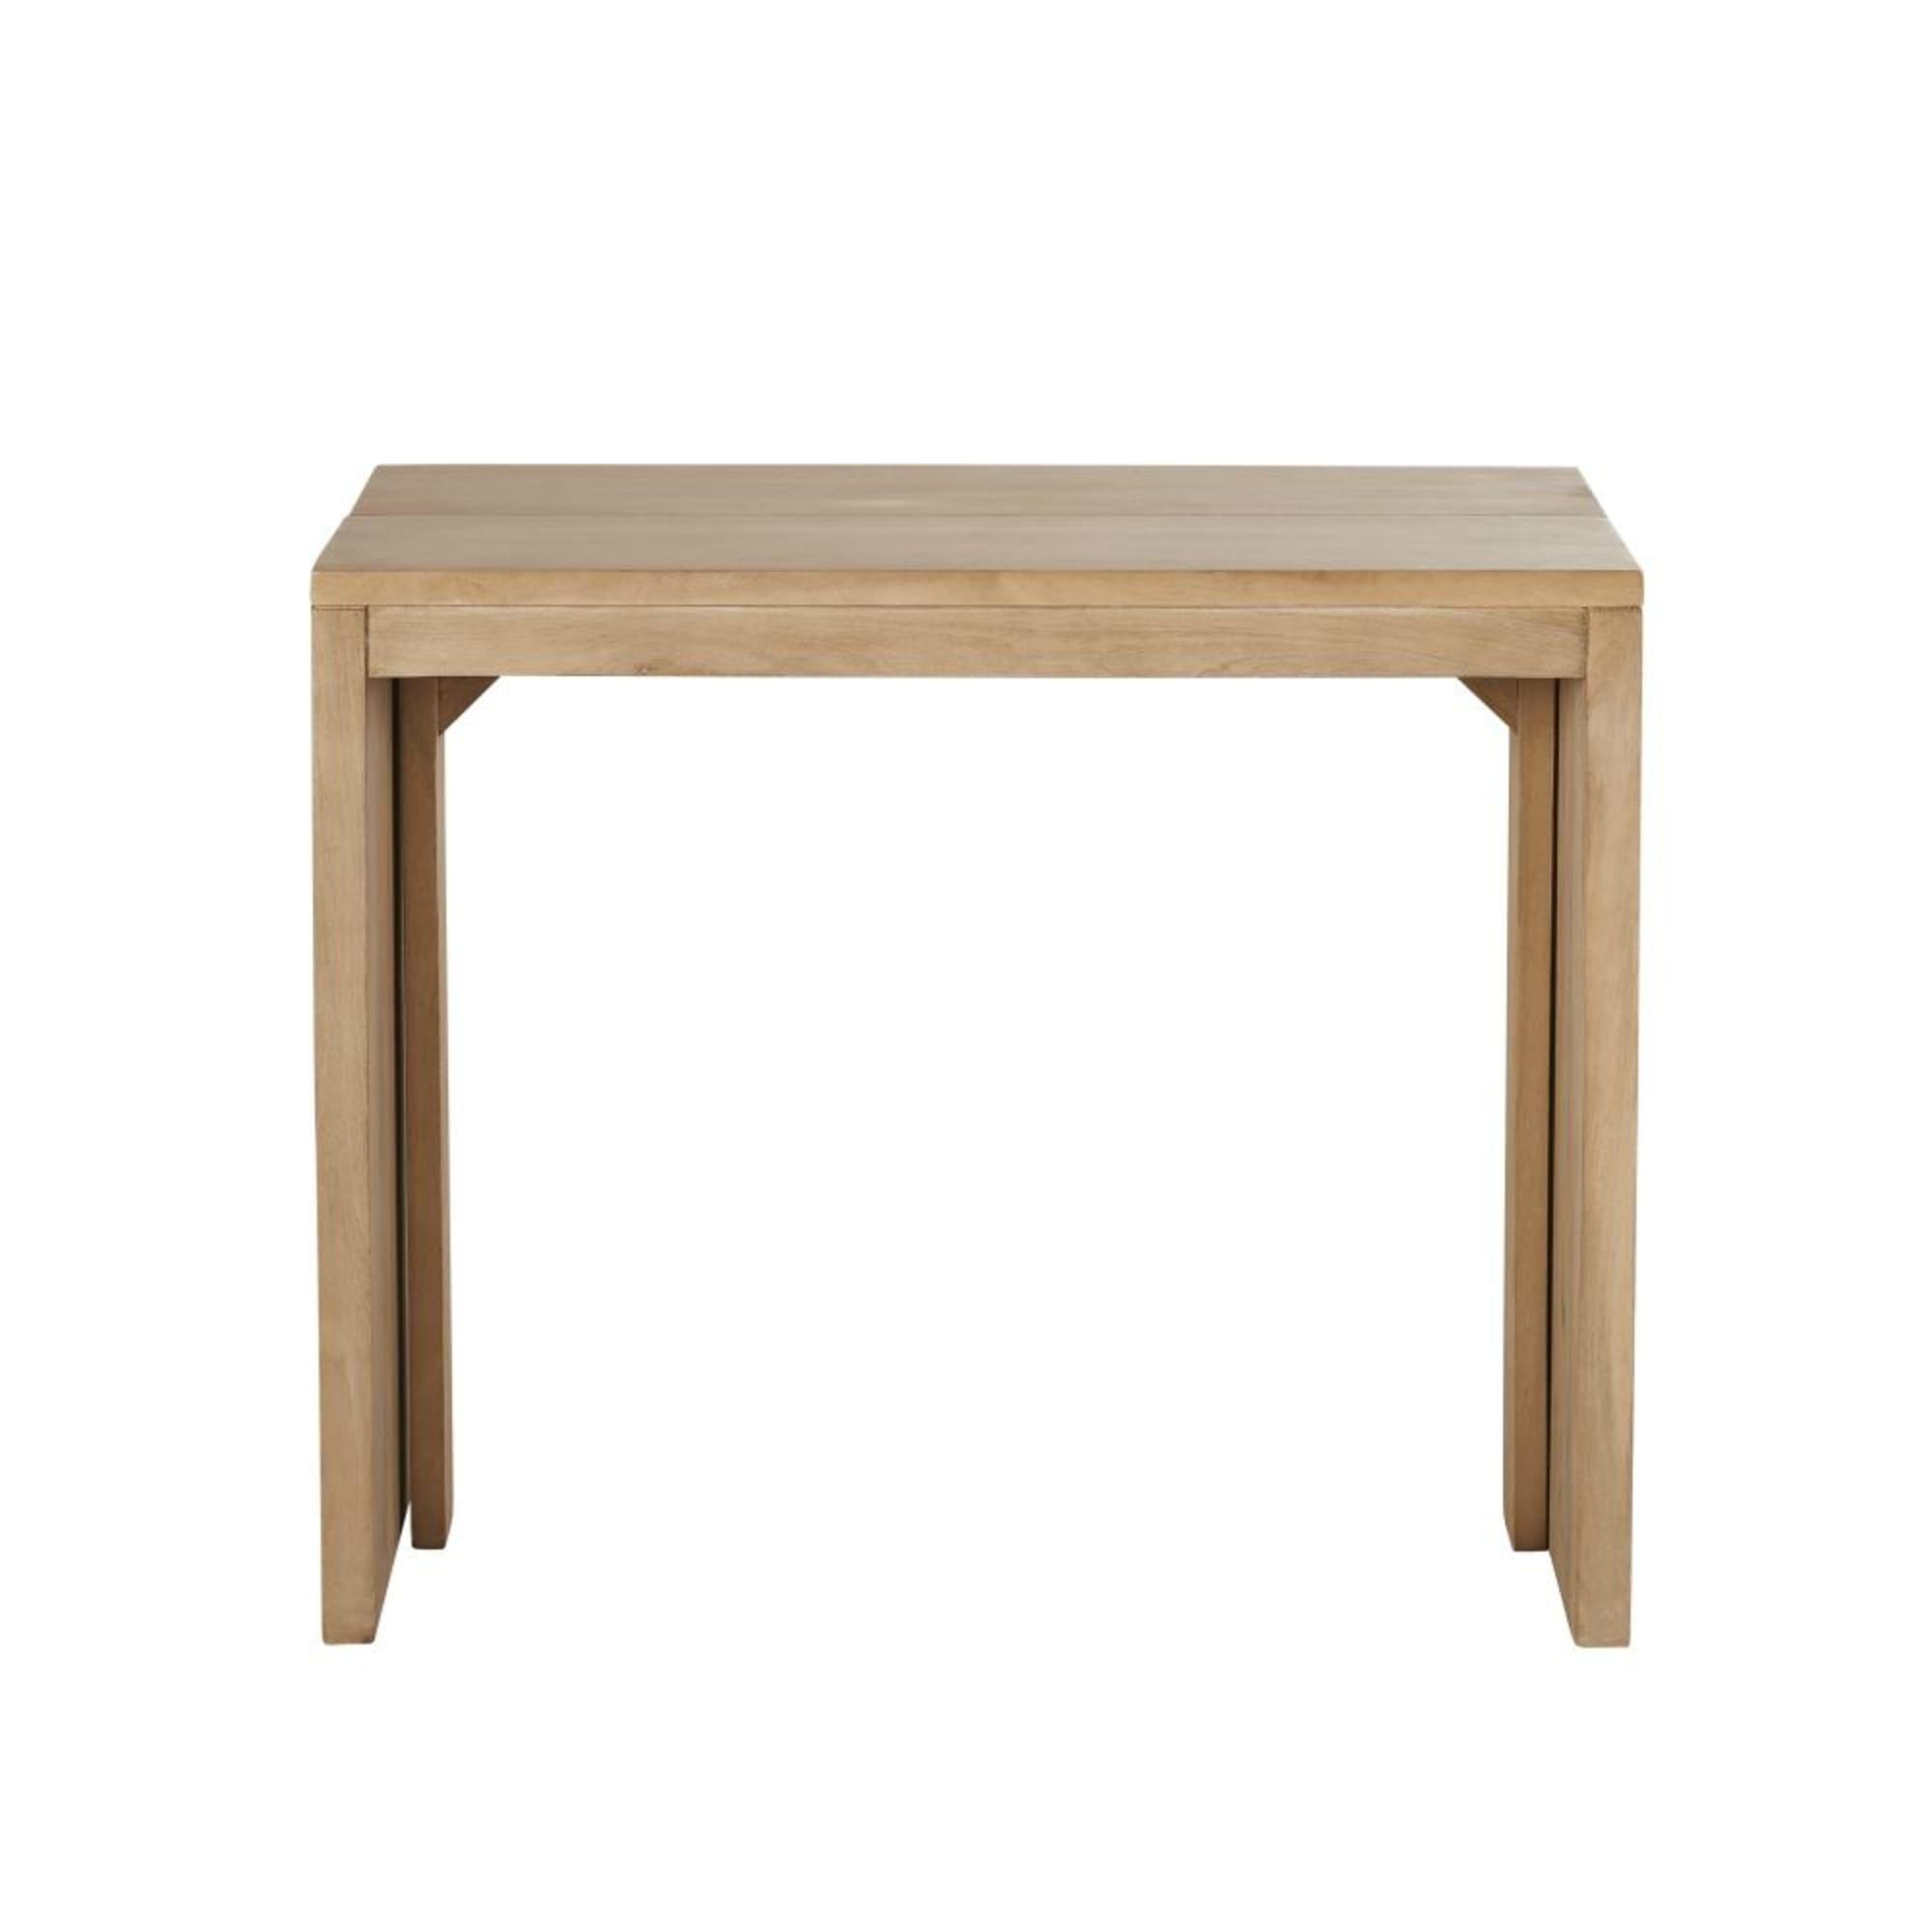 Mango Wood Extendable 6 Seater Dining Table W40 160 Alagaos Maisons Du Monde En 2020 Table Console Extensible Console Extensible Table A Manger Extensible